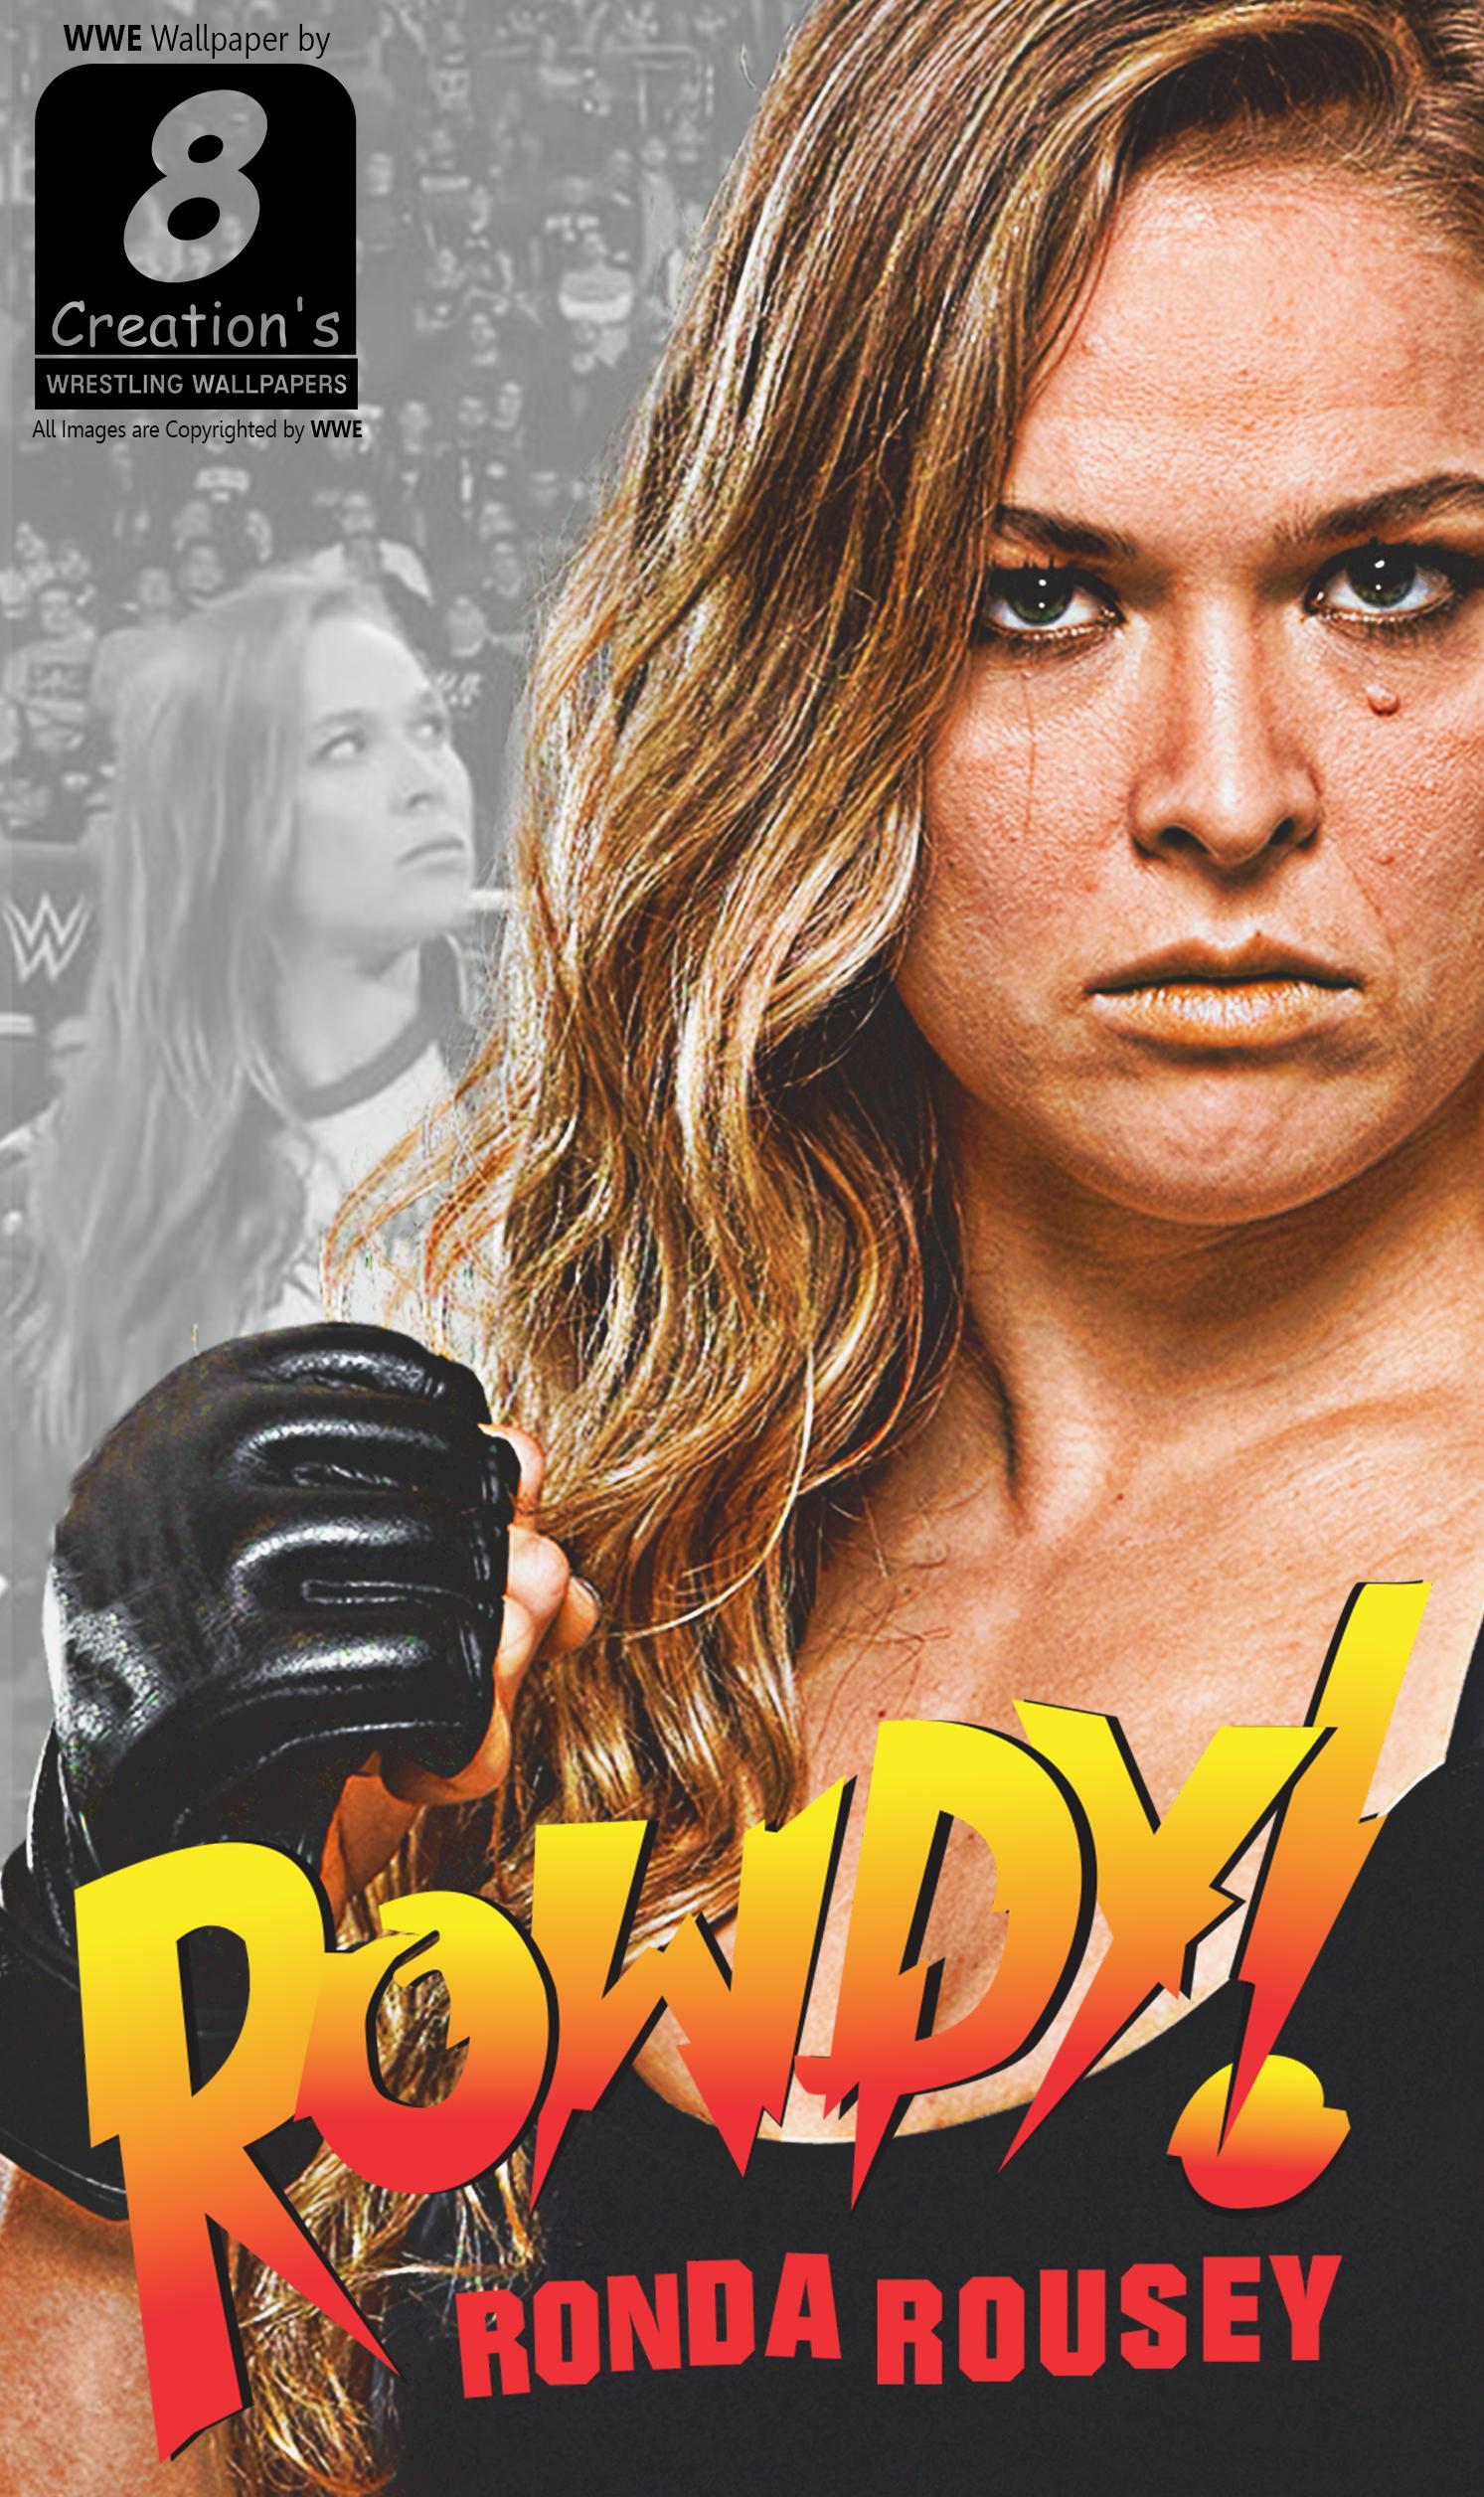 Ronda rousey 2018 iphone wallpaper by arunraj1791 on - Ronda rousey wallpaper ...